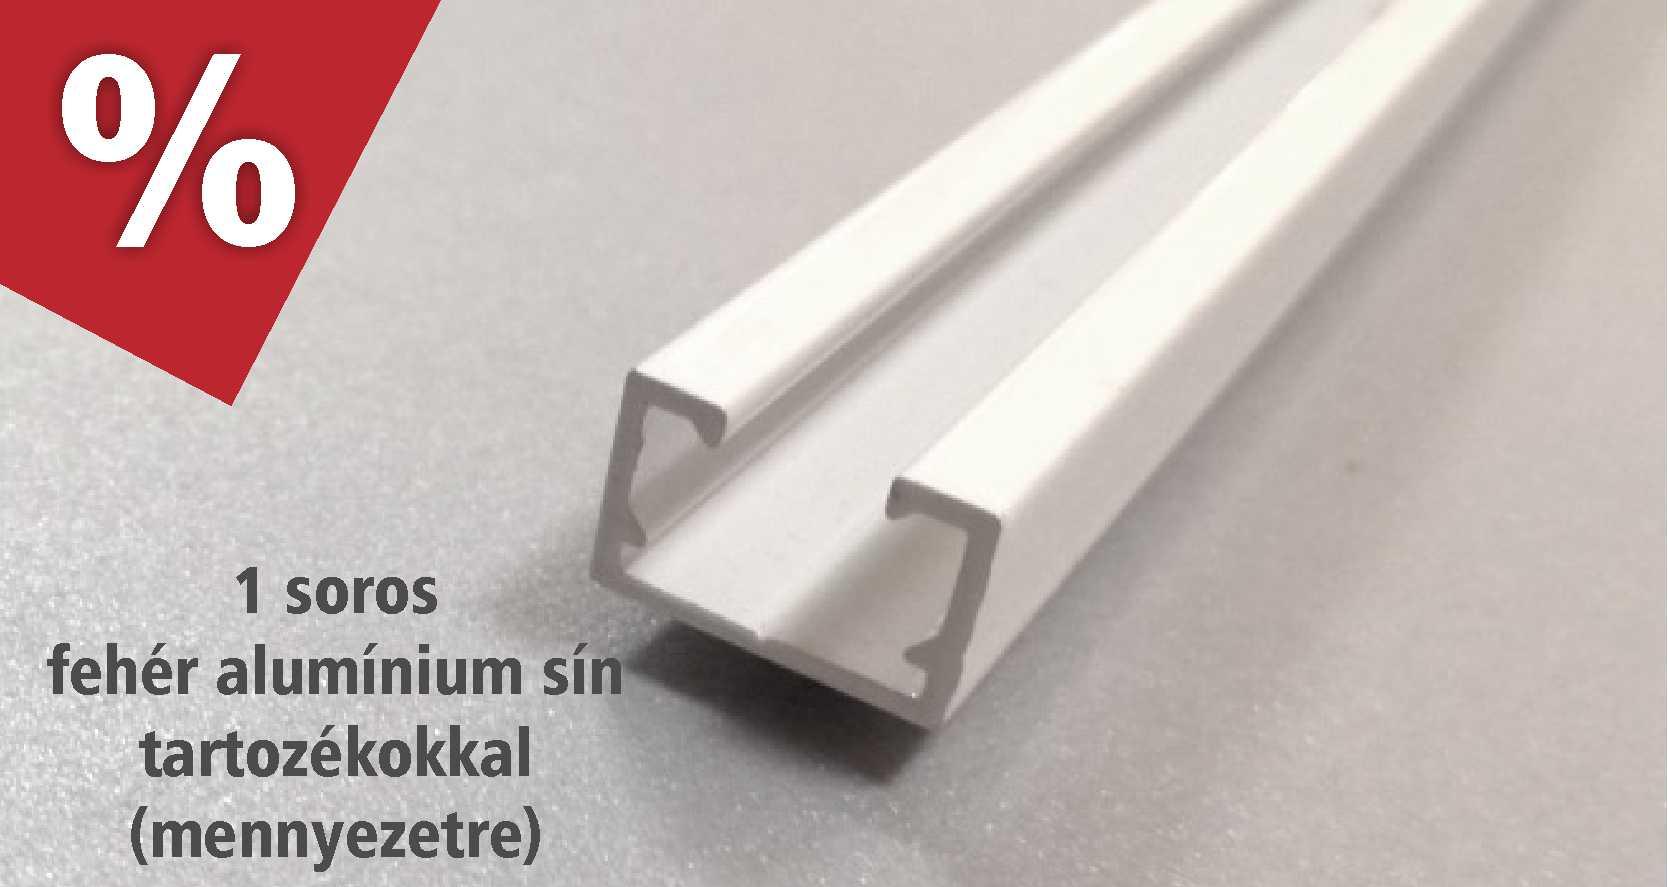 1 soros fehér alumínium függönysín bevezető akcióban - www.karnisstudio.hu